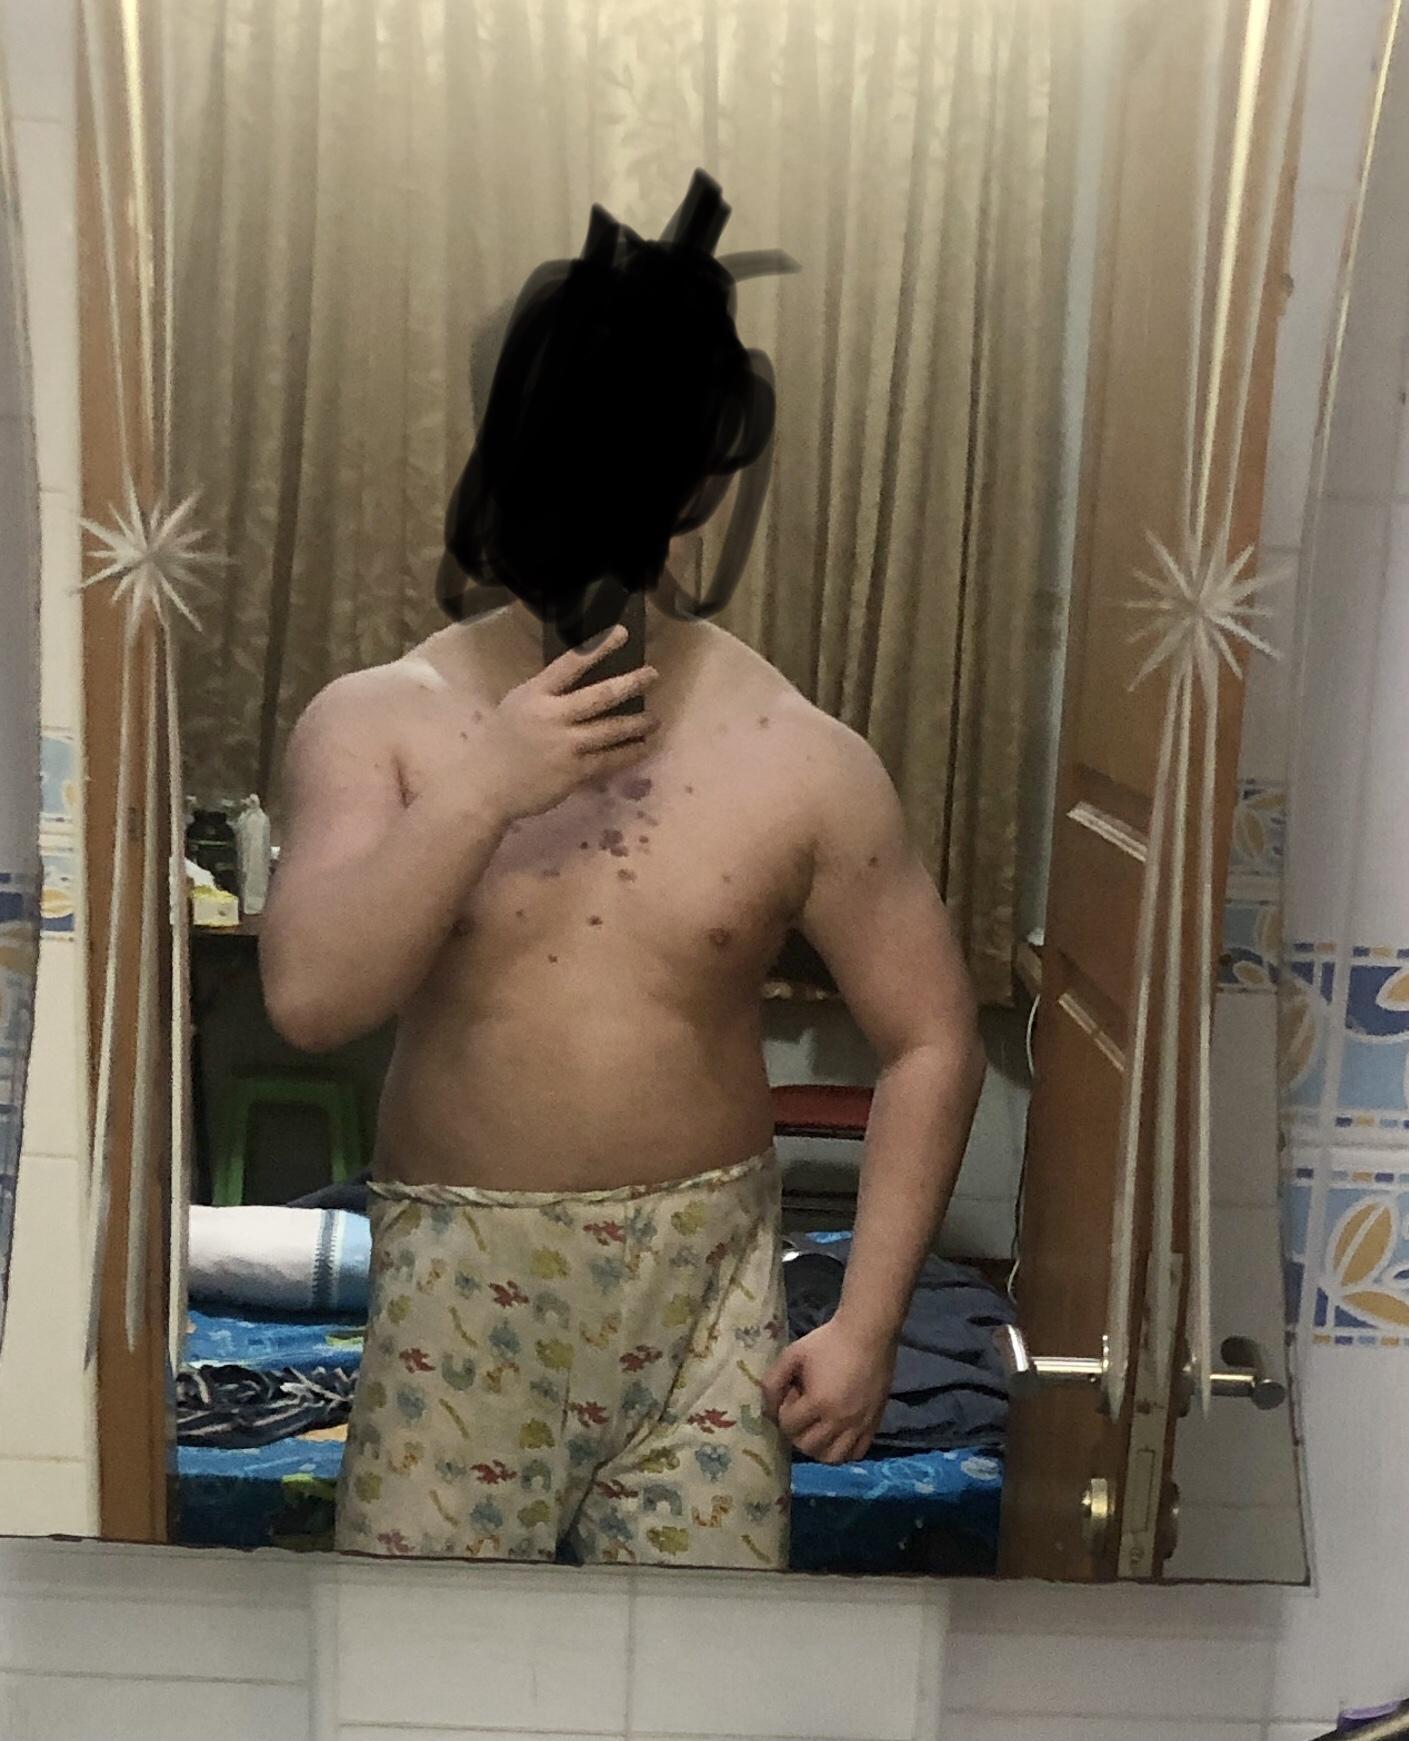 5'8 Male Progress Pics of 35 lbs Weight Gain 155 lbs to 190 lbs